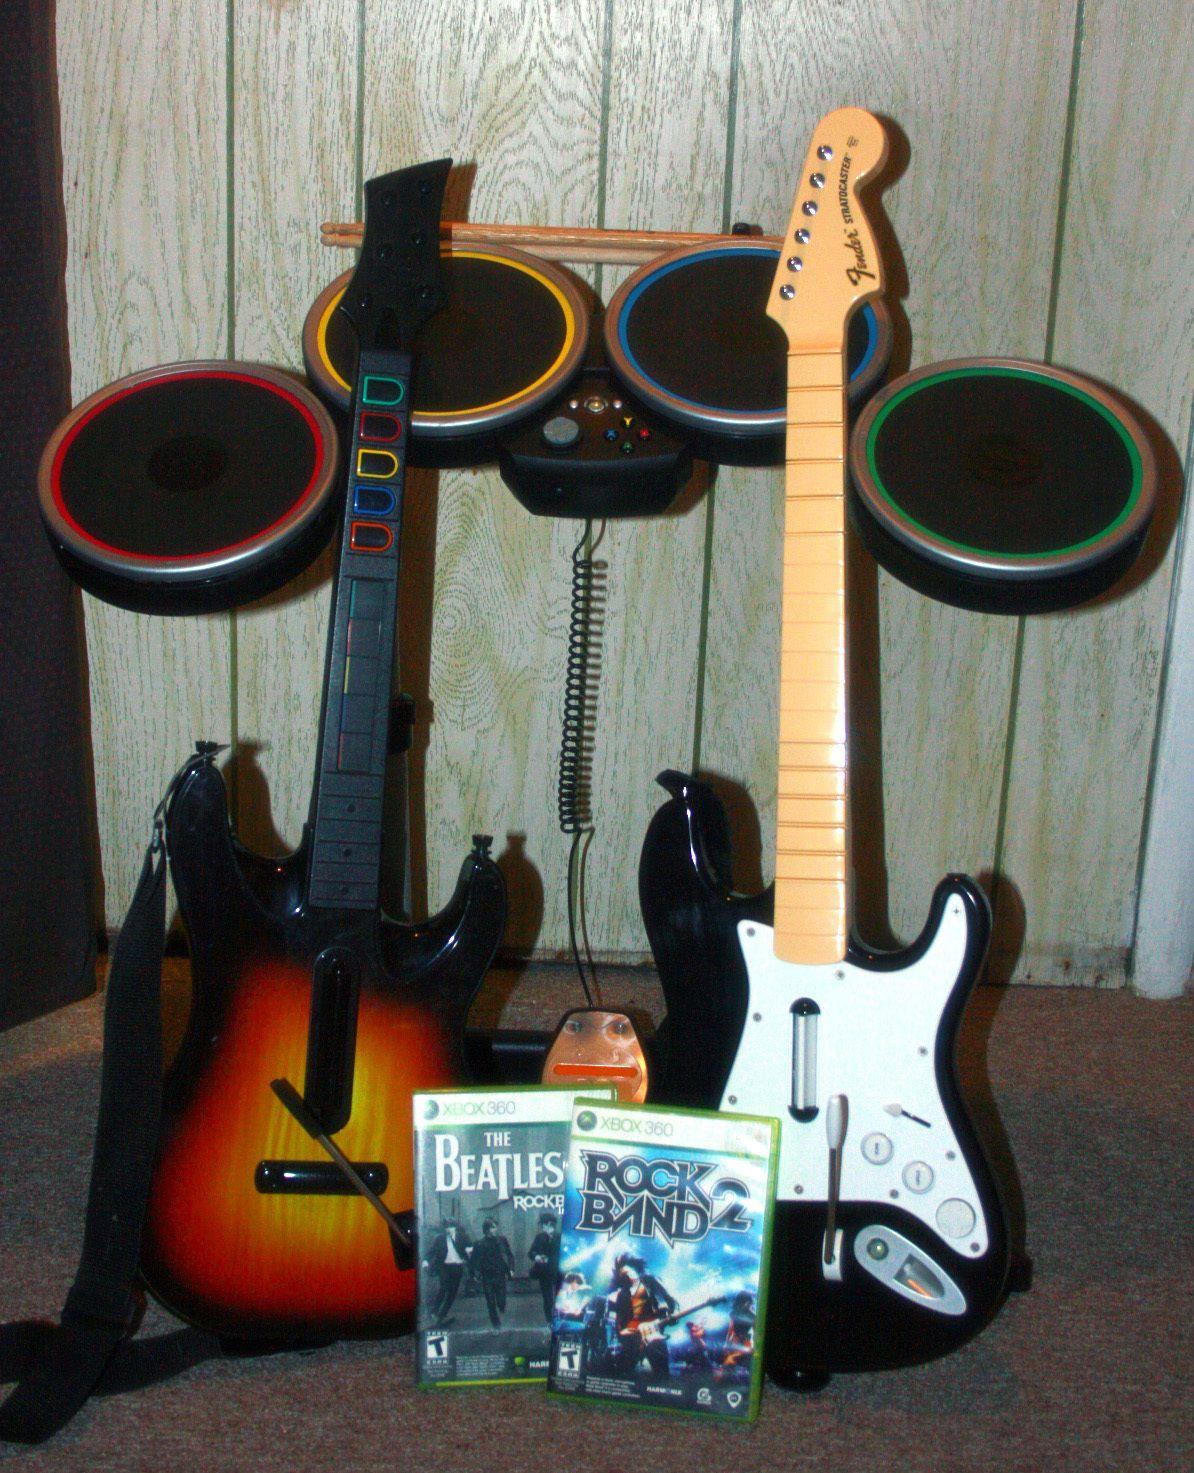 Xbox 360 Rockband 2 Bundle Wireless Drums Guitars Rock Band Christmas List